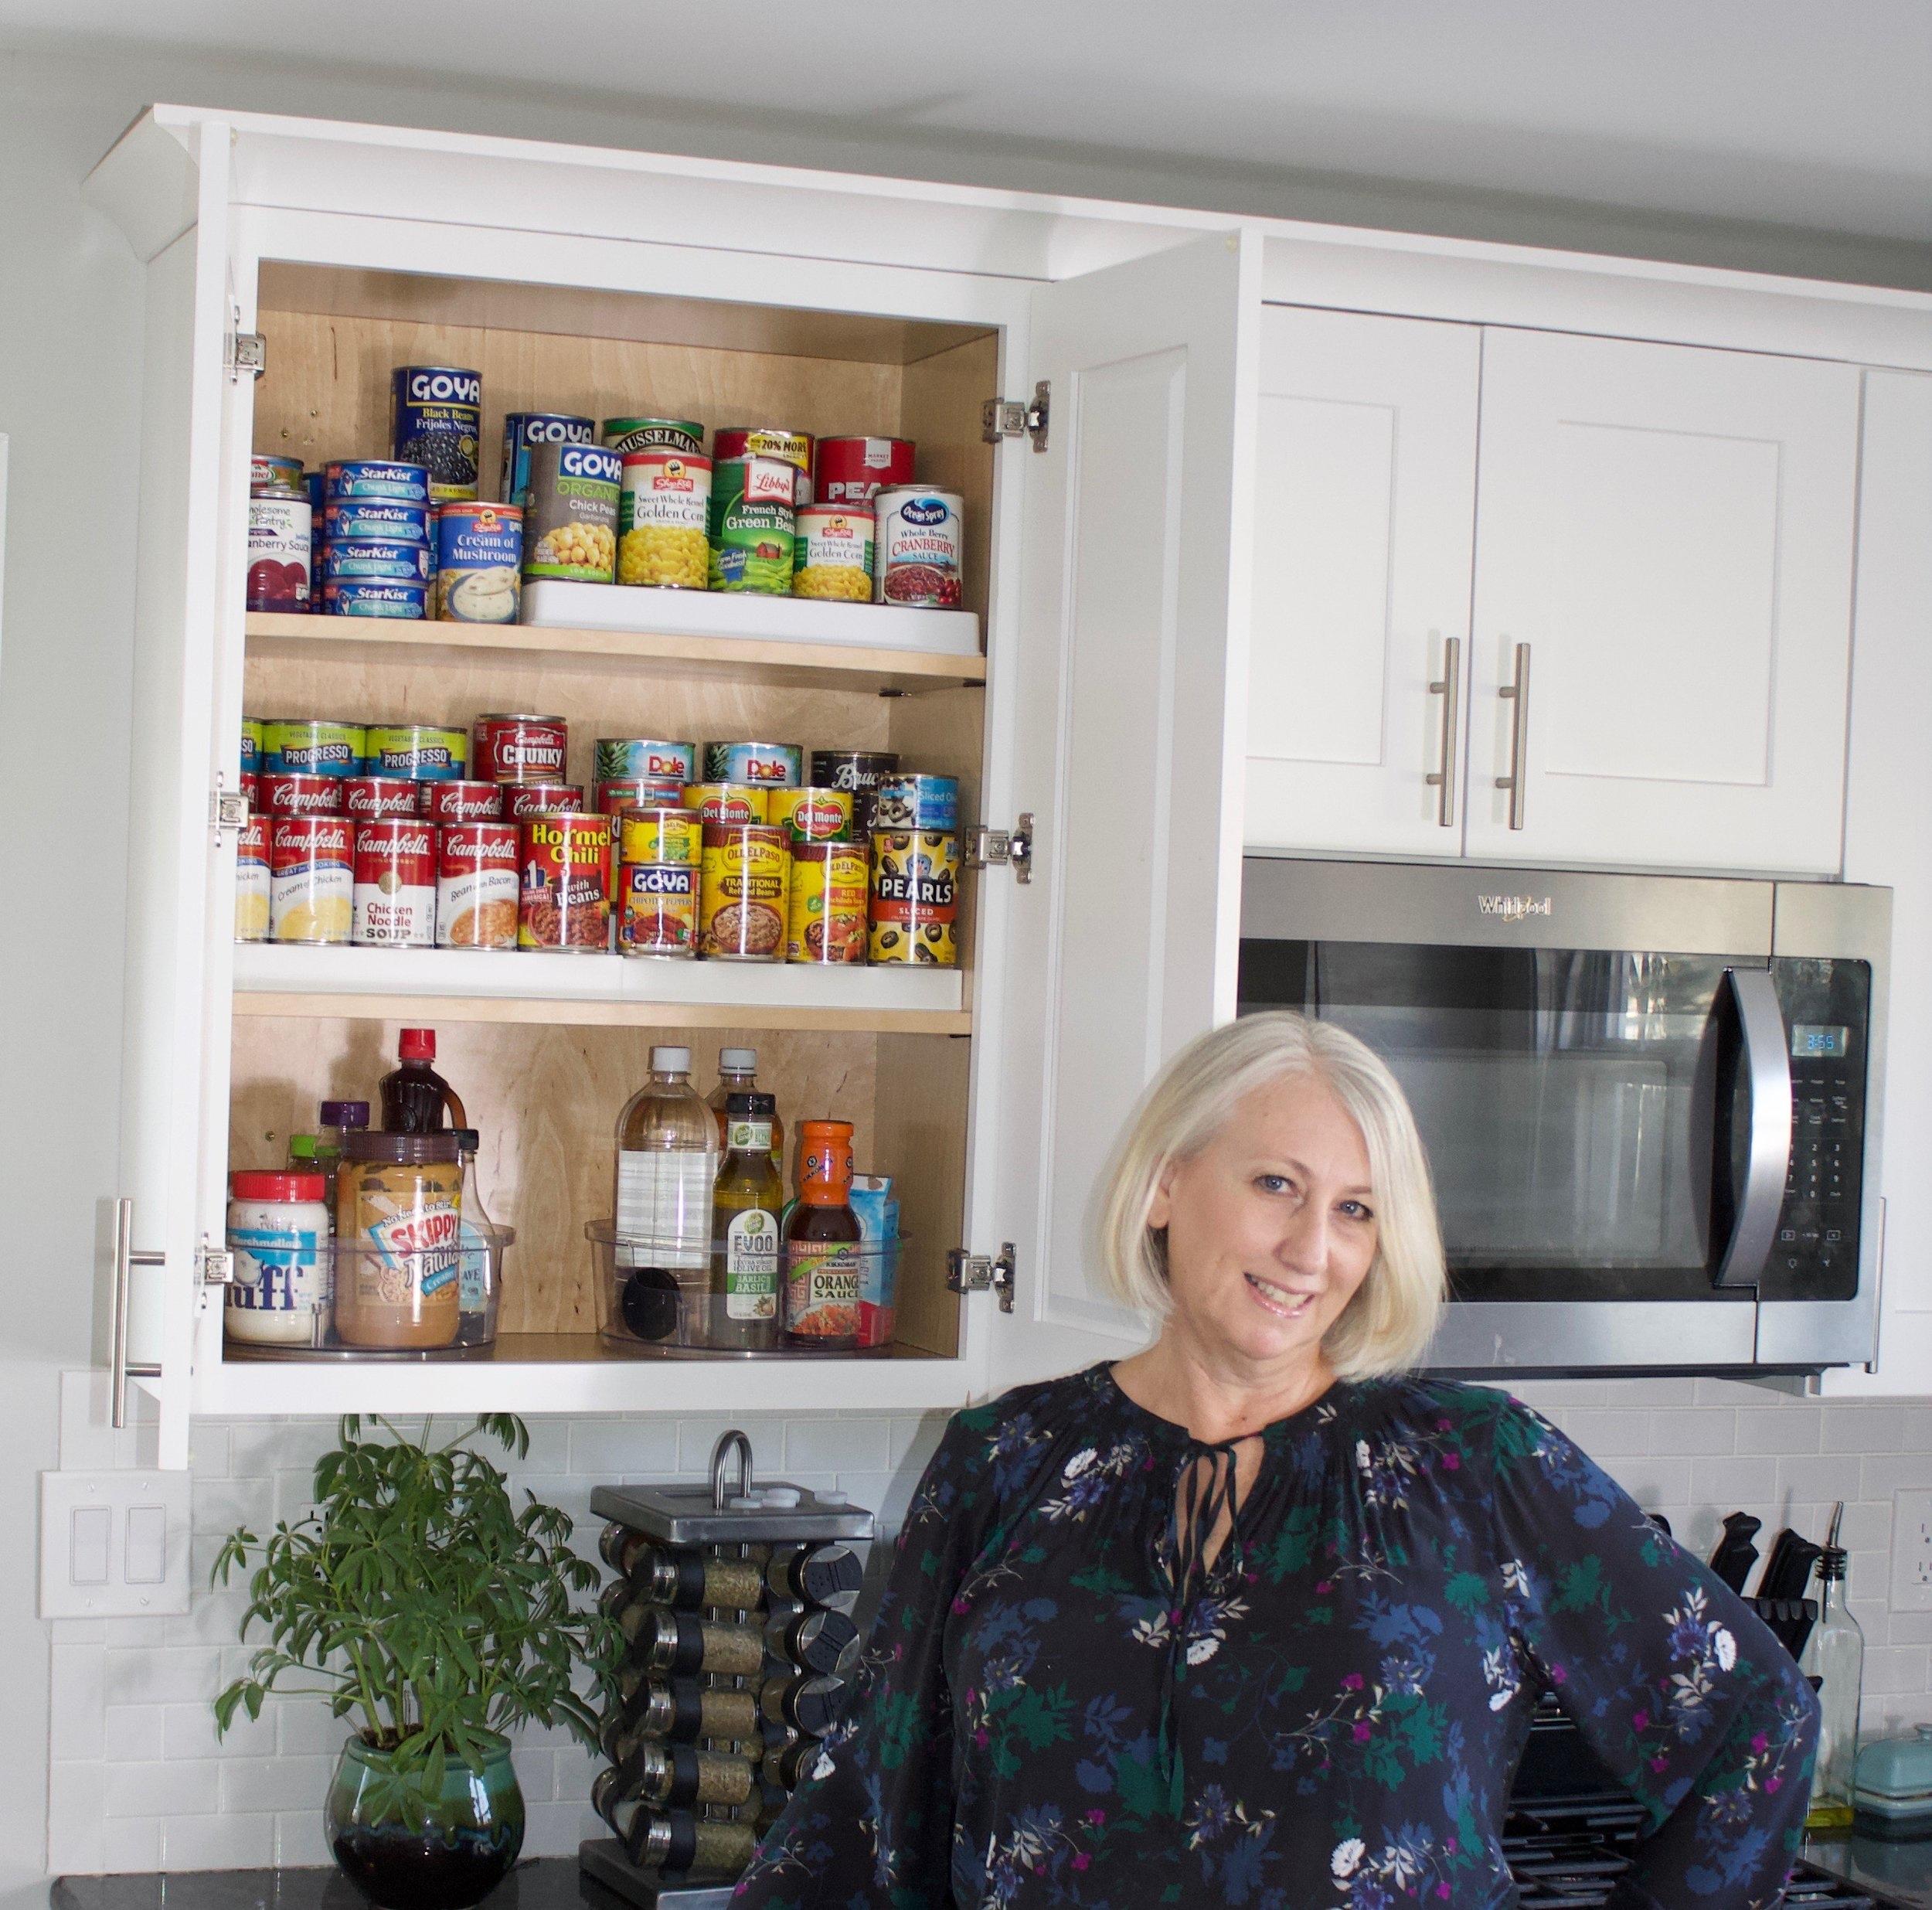 Meet Kristen - Professional Home Organizer